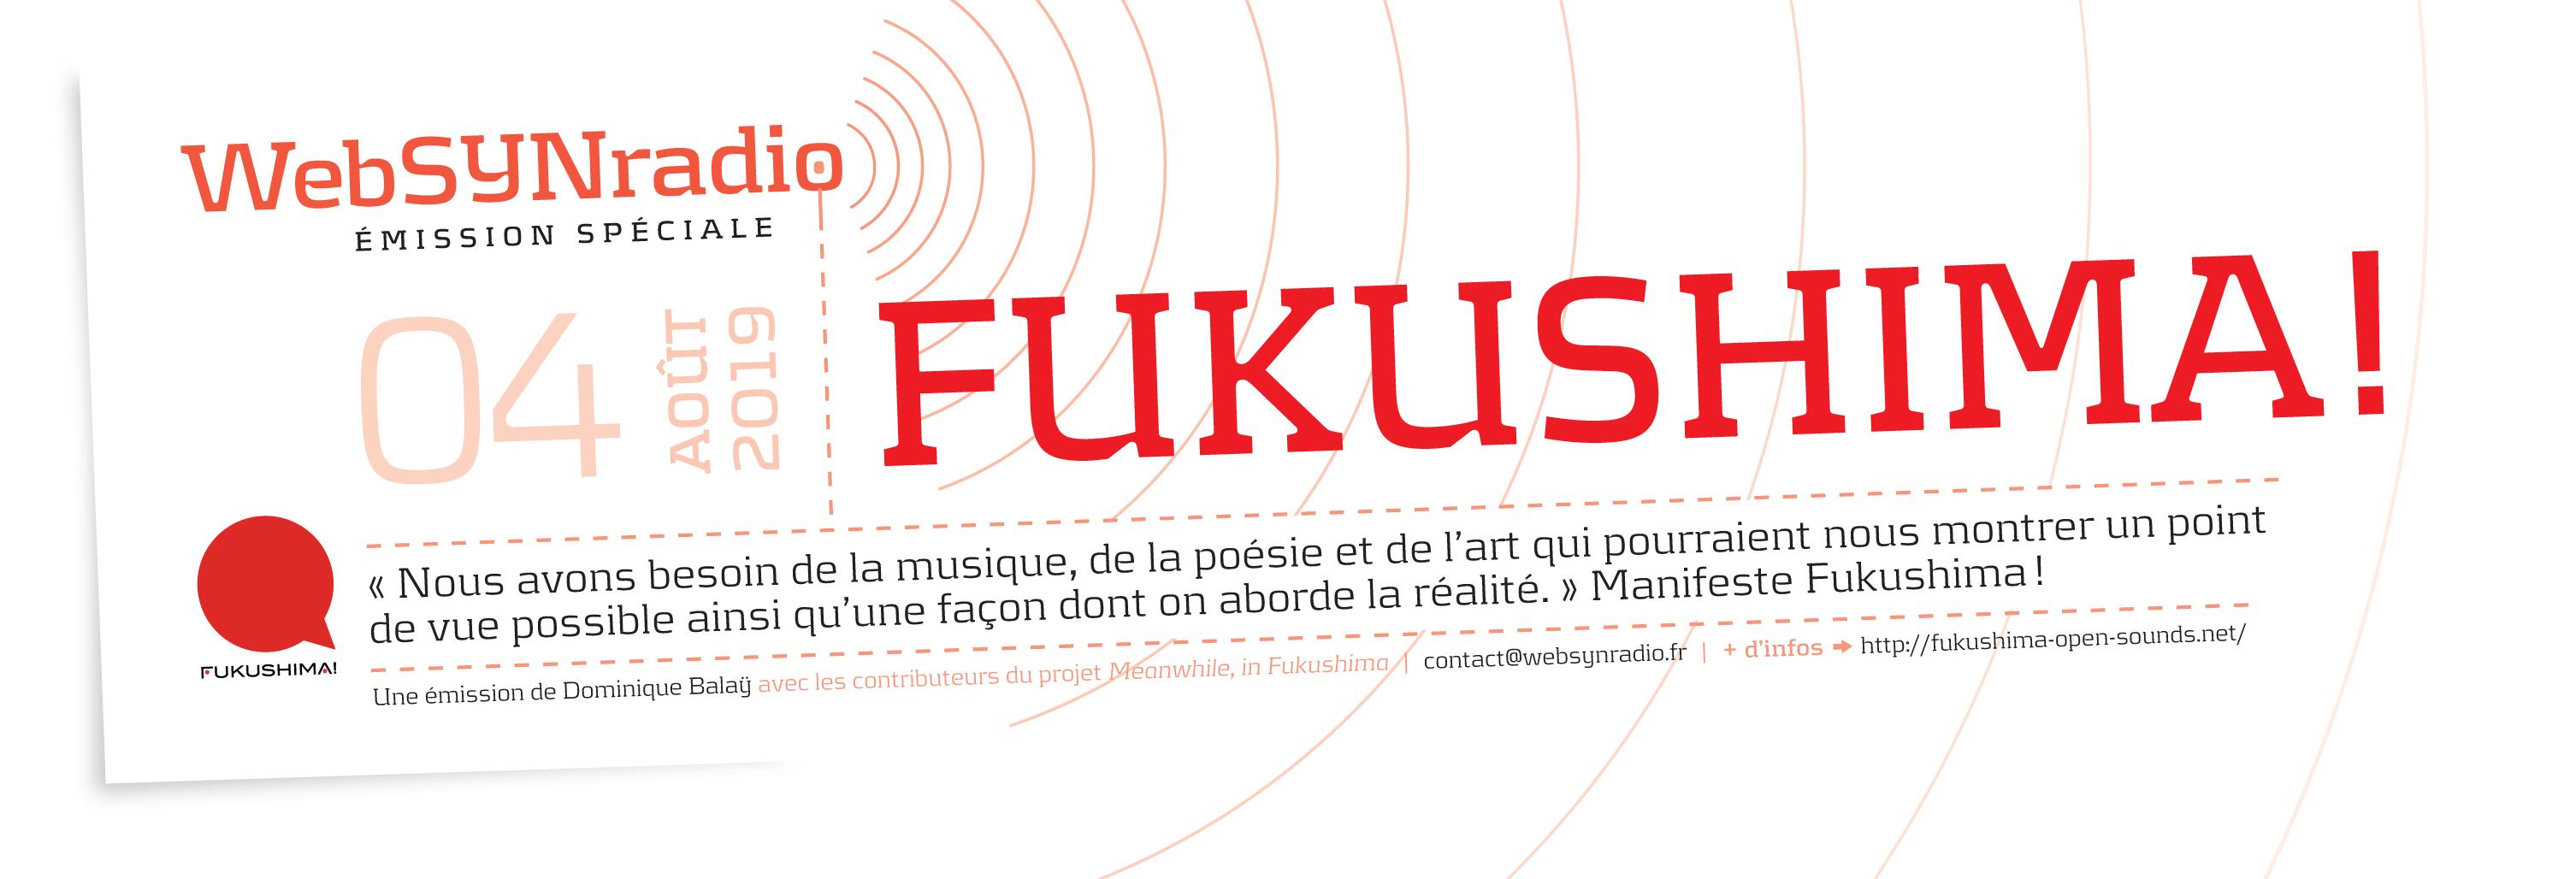 webSYNradio SYN-flyer-FUKUSHIMA-040819-fra festival Fukushima! : 9eme édition Fukushima Programme